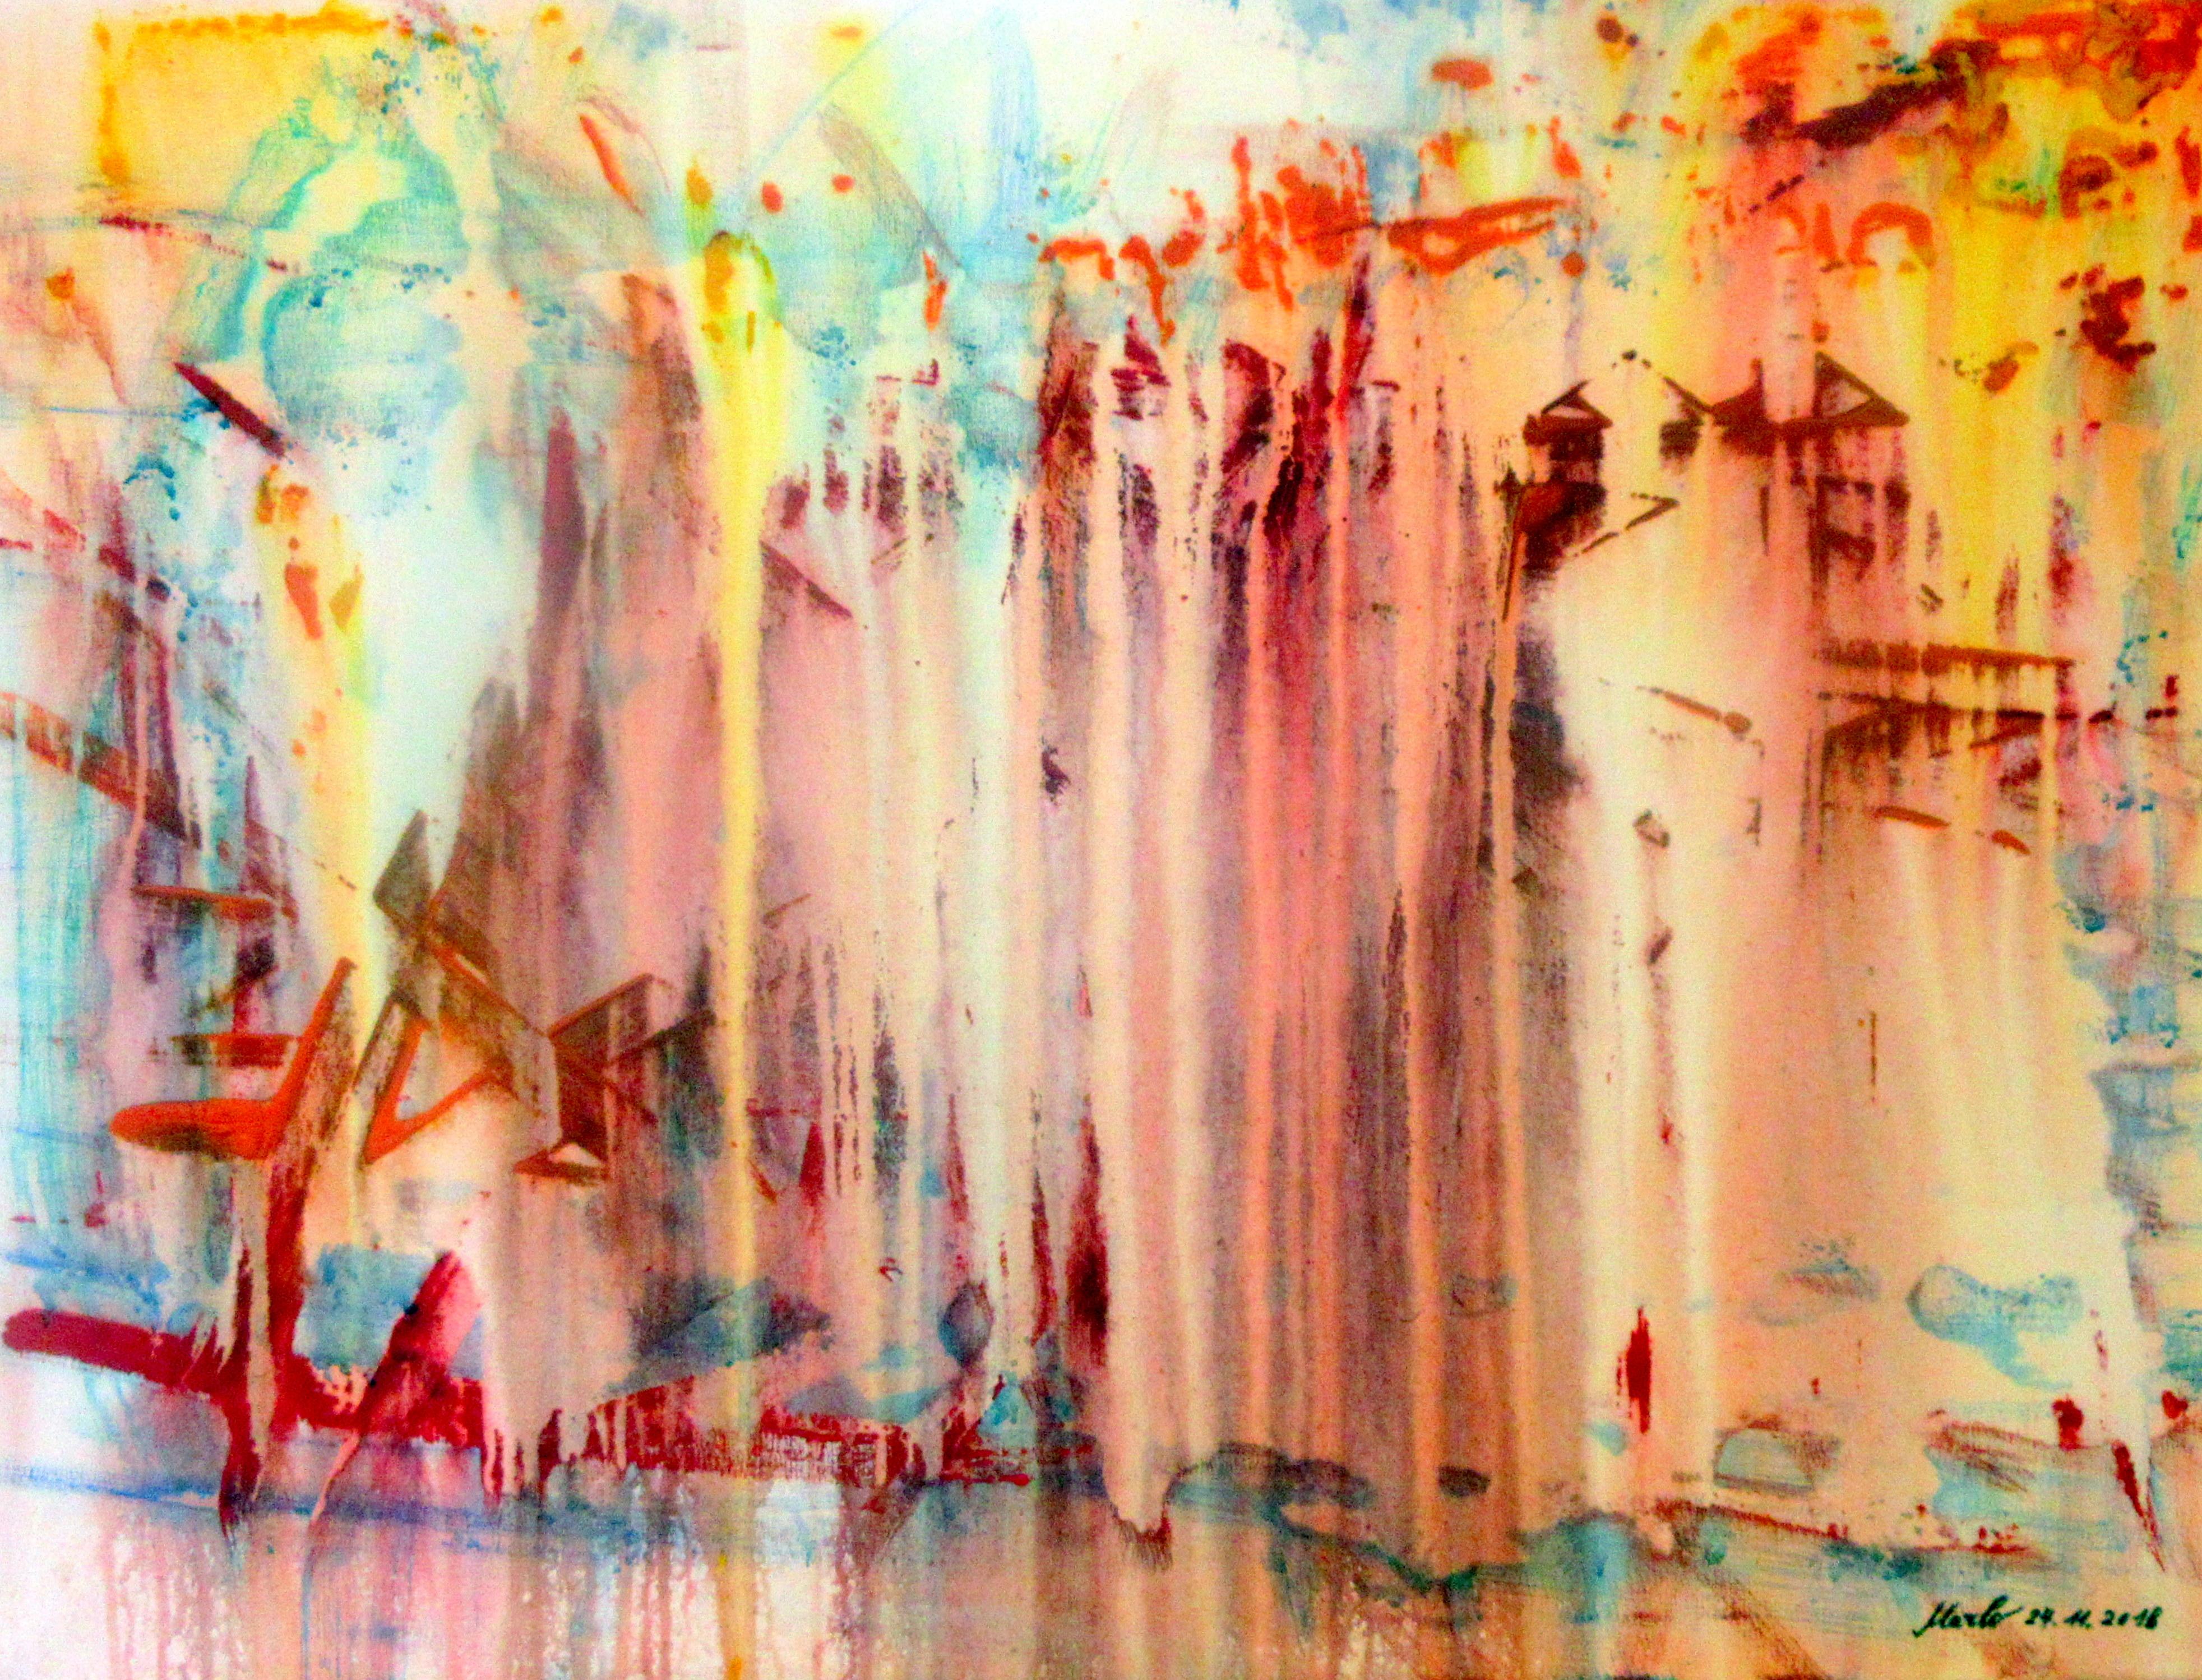 The lost city. Acrylic on canvas, 80 xm H x 60 cm W. 28.11.2018